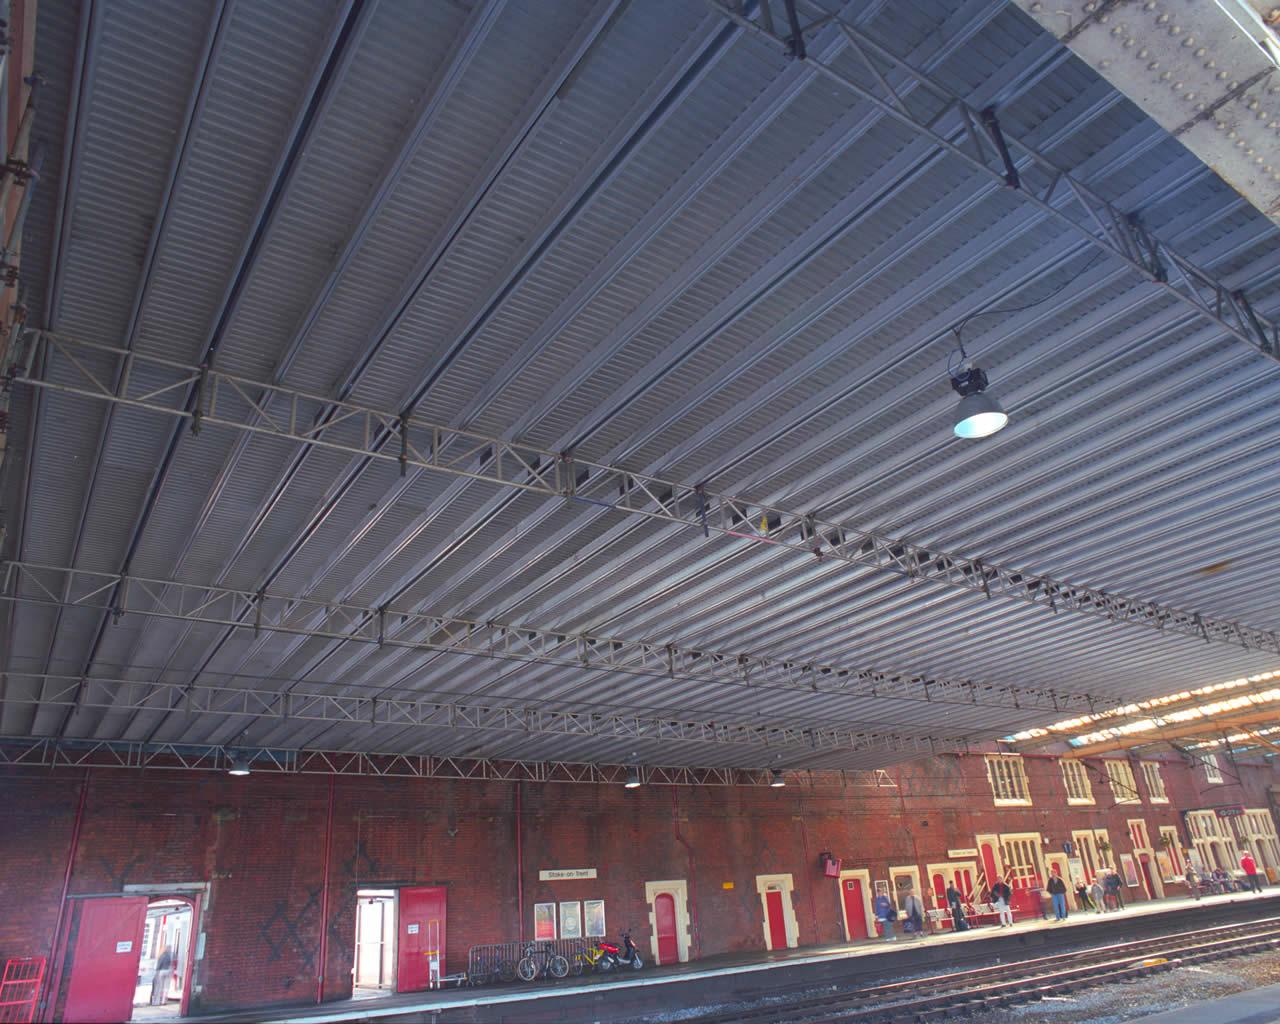 Stoke On Trent Main Railway Station